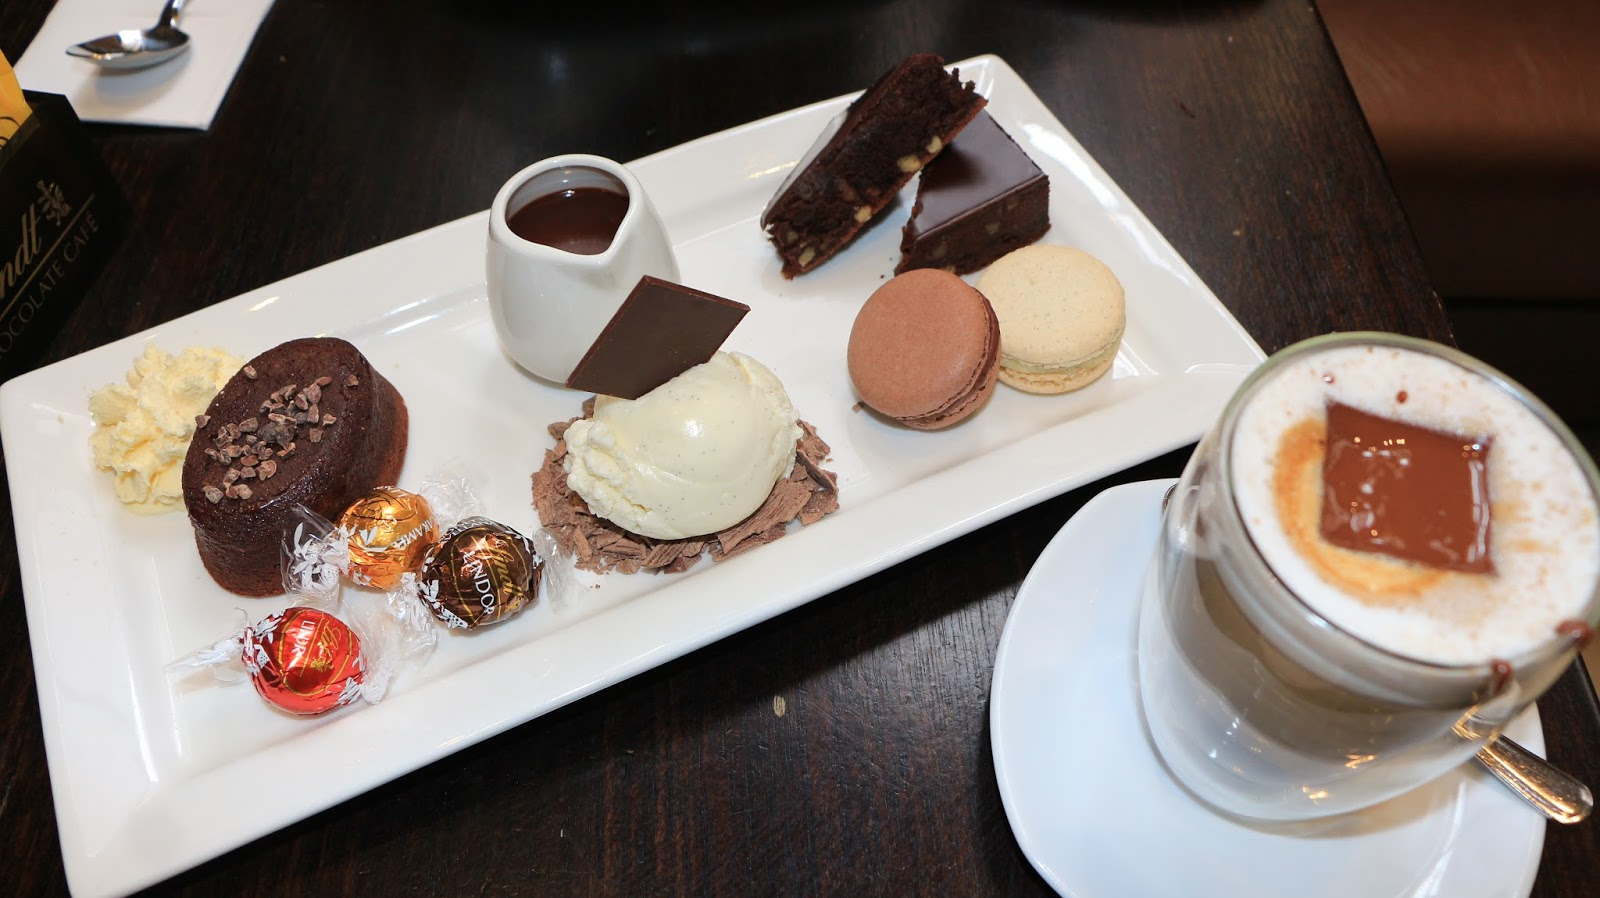 Lindt chocolate platter